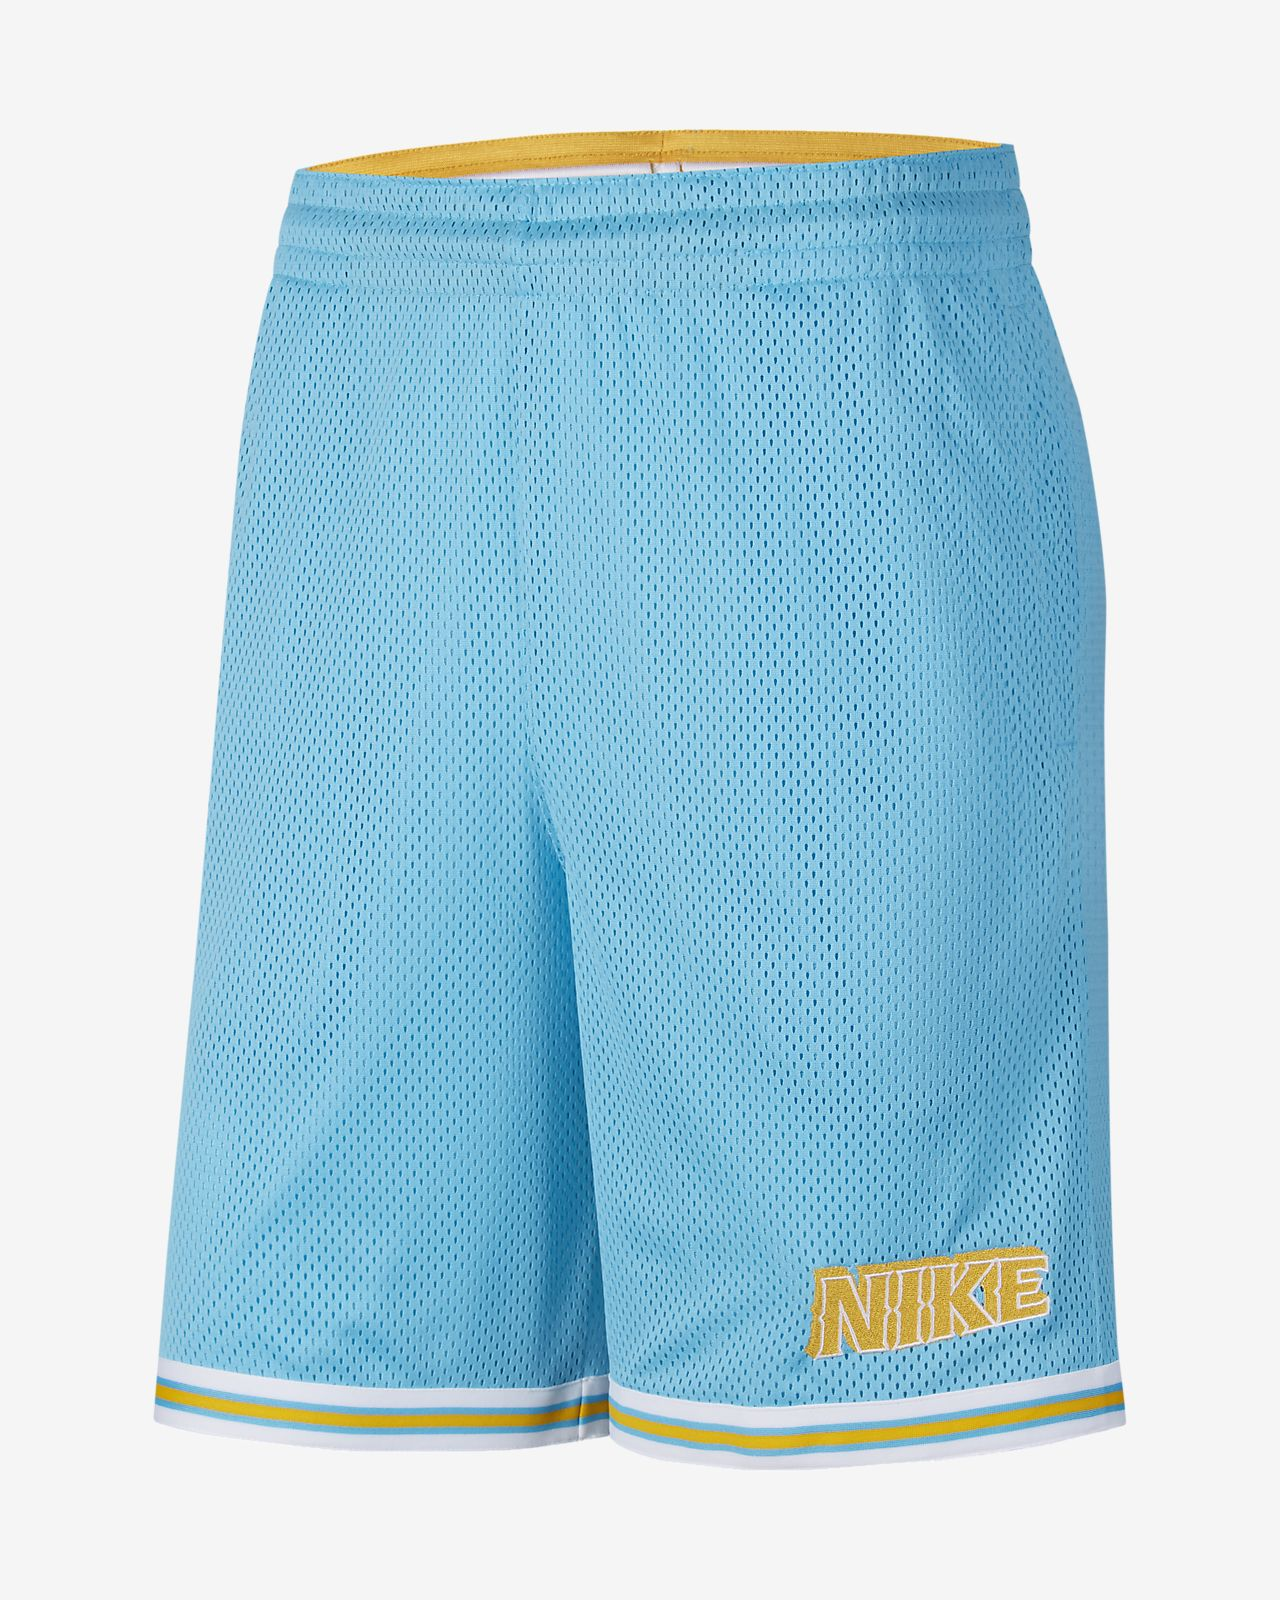 Nike Dri-FIT Classic 男款籃球褲